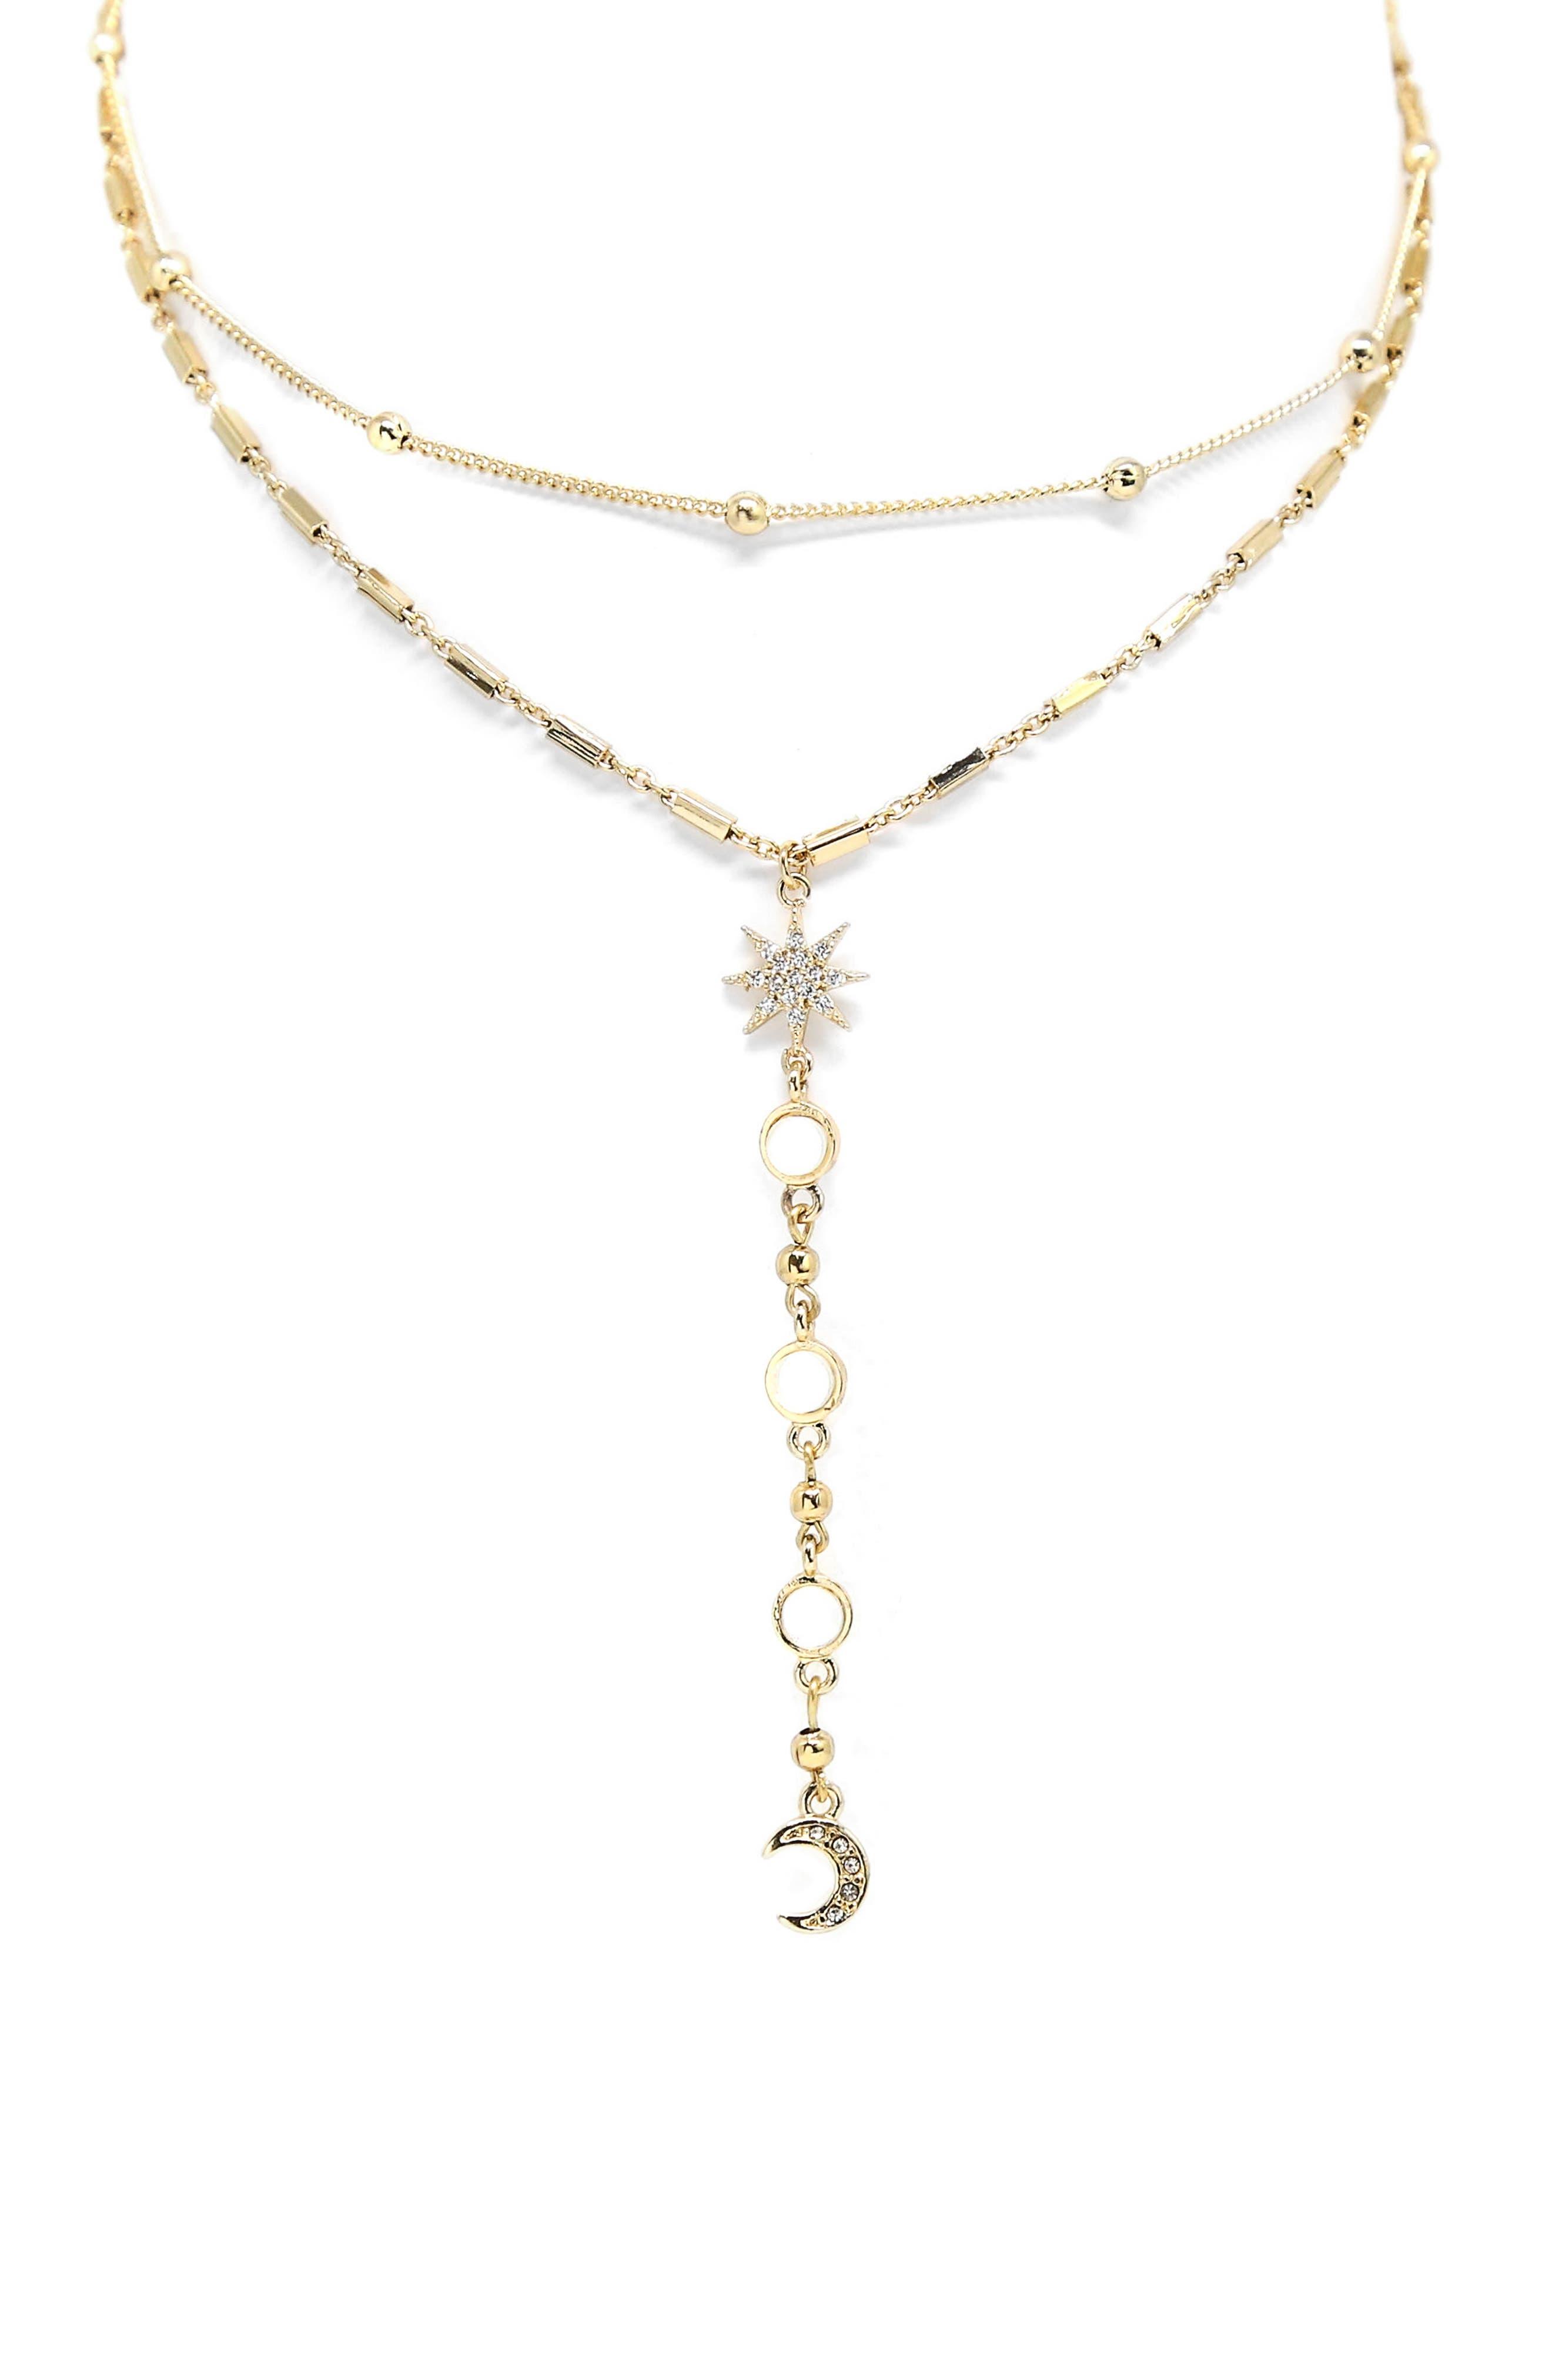 Main Image - Ettika Lariat Choker Necklace